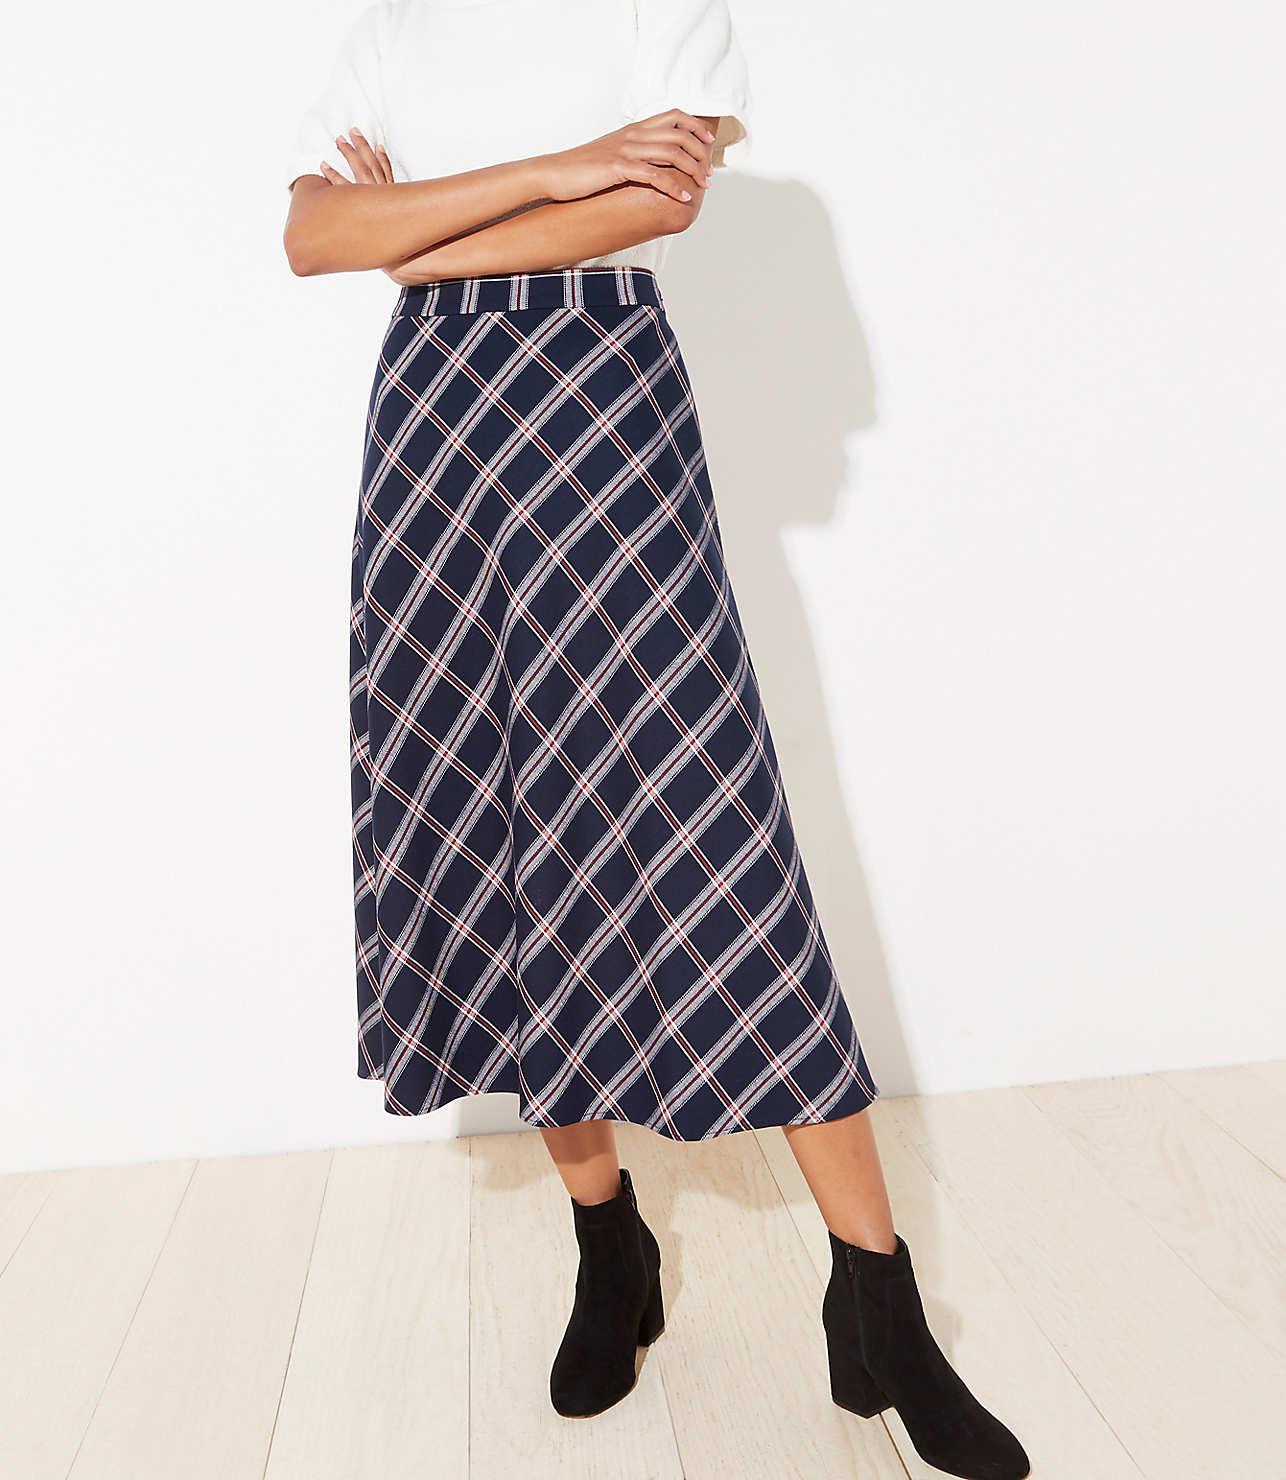 hot-selling latest new list enjoy discount price Petite Plaid Midi Skirt | LOFT